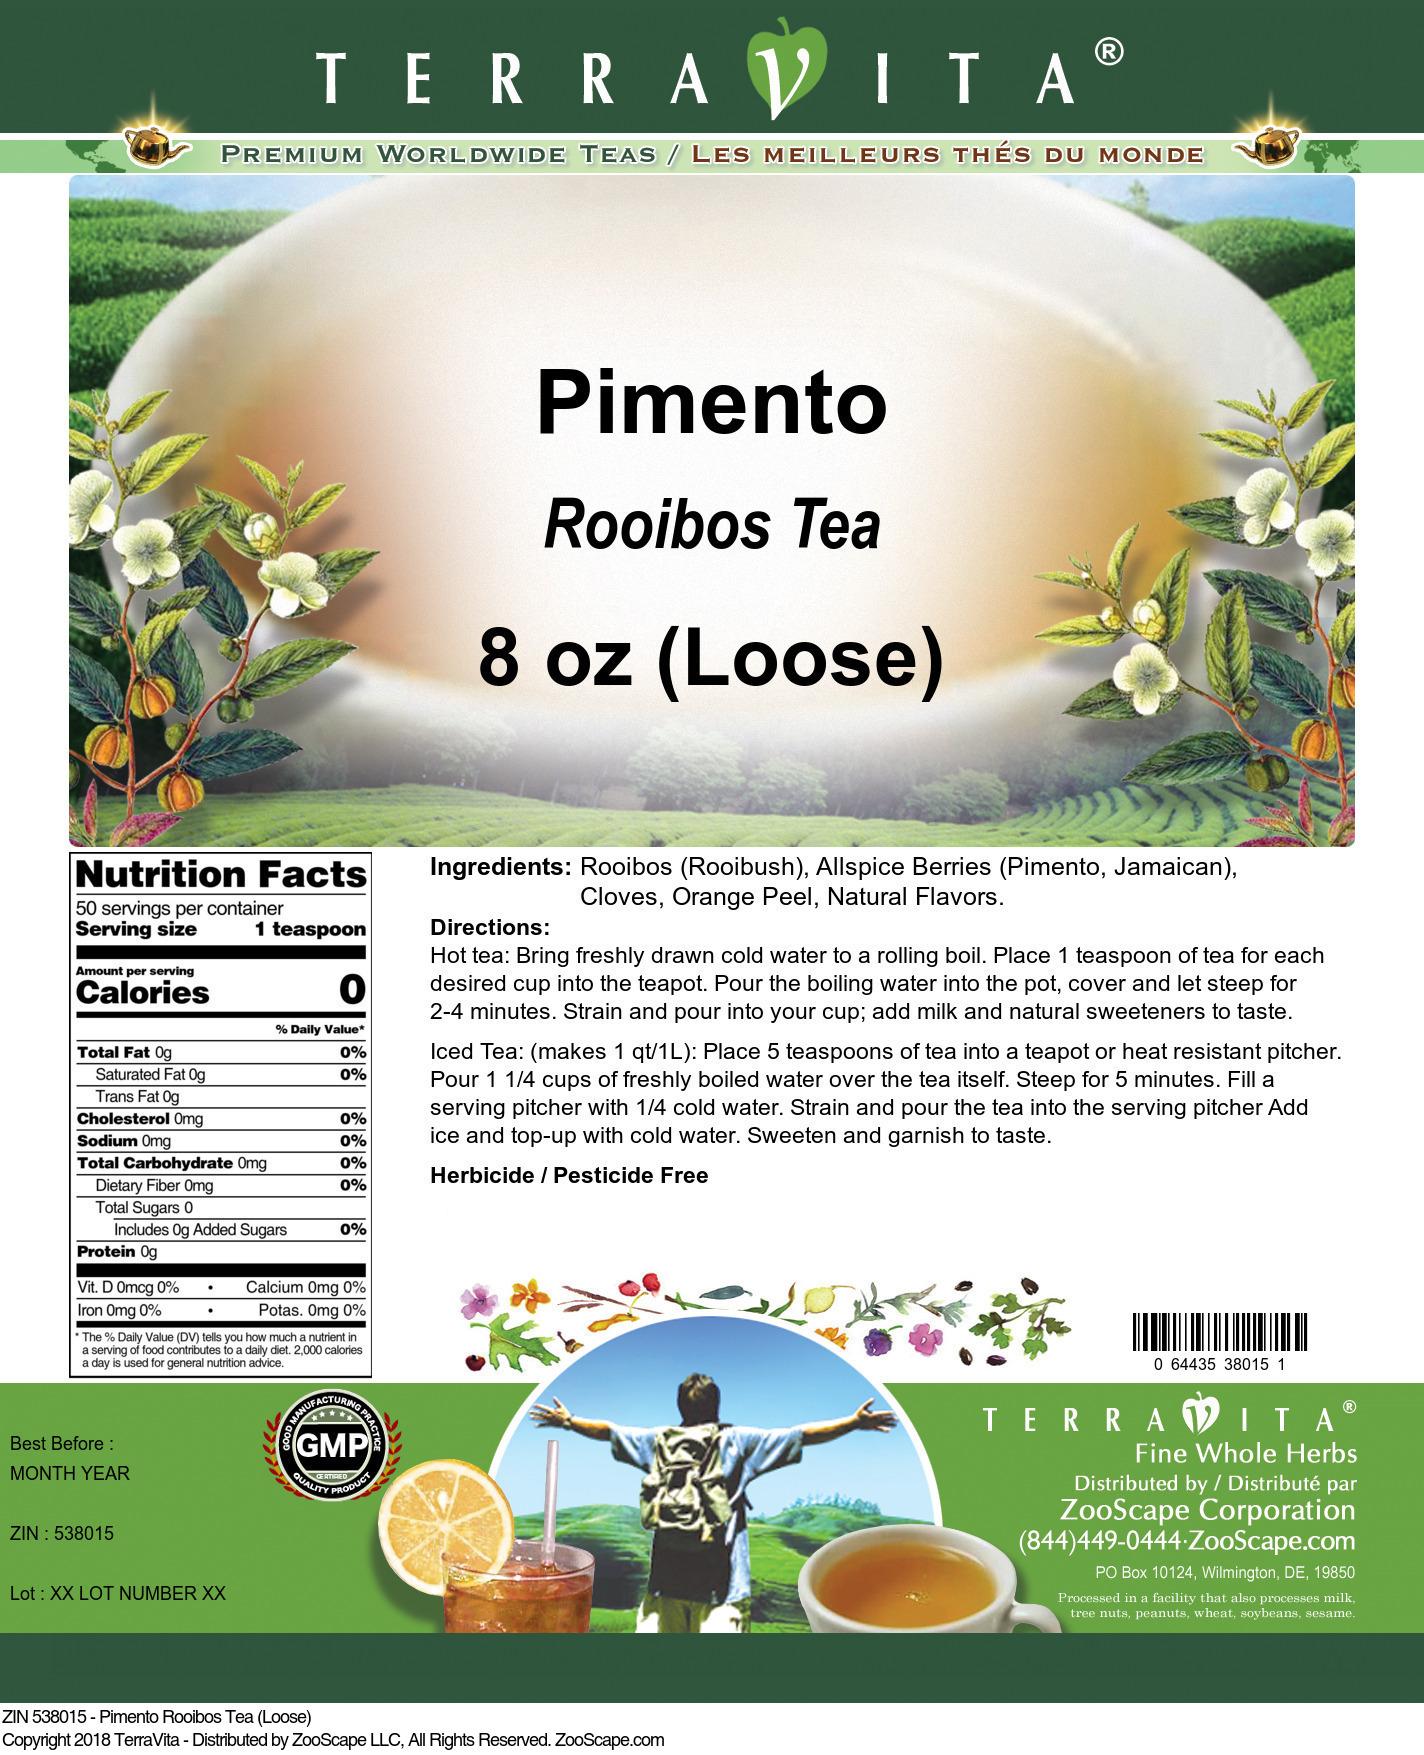 Pimento Rooibos Tea (Loose)